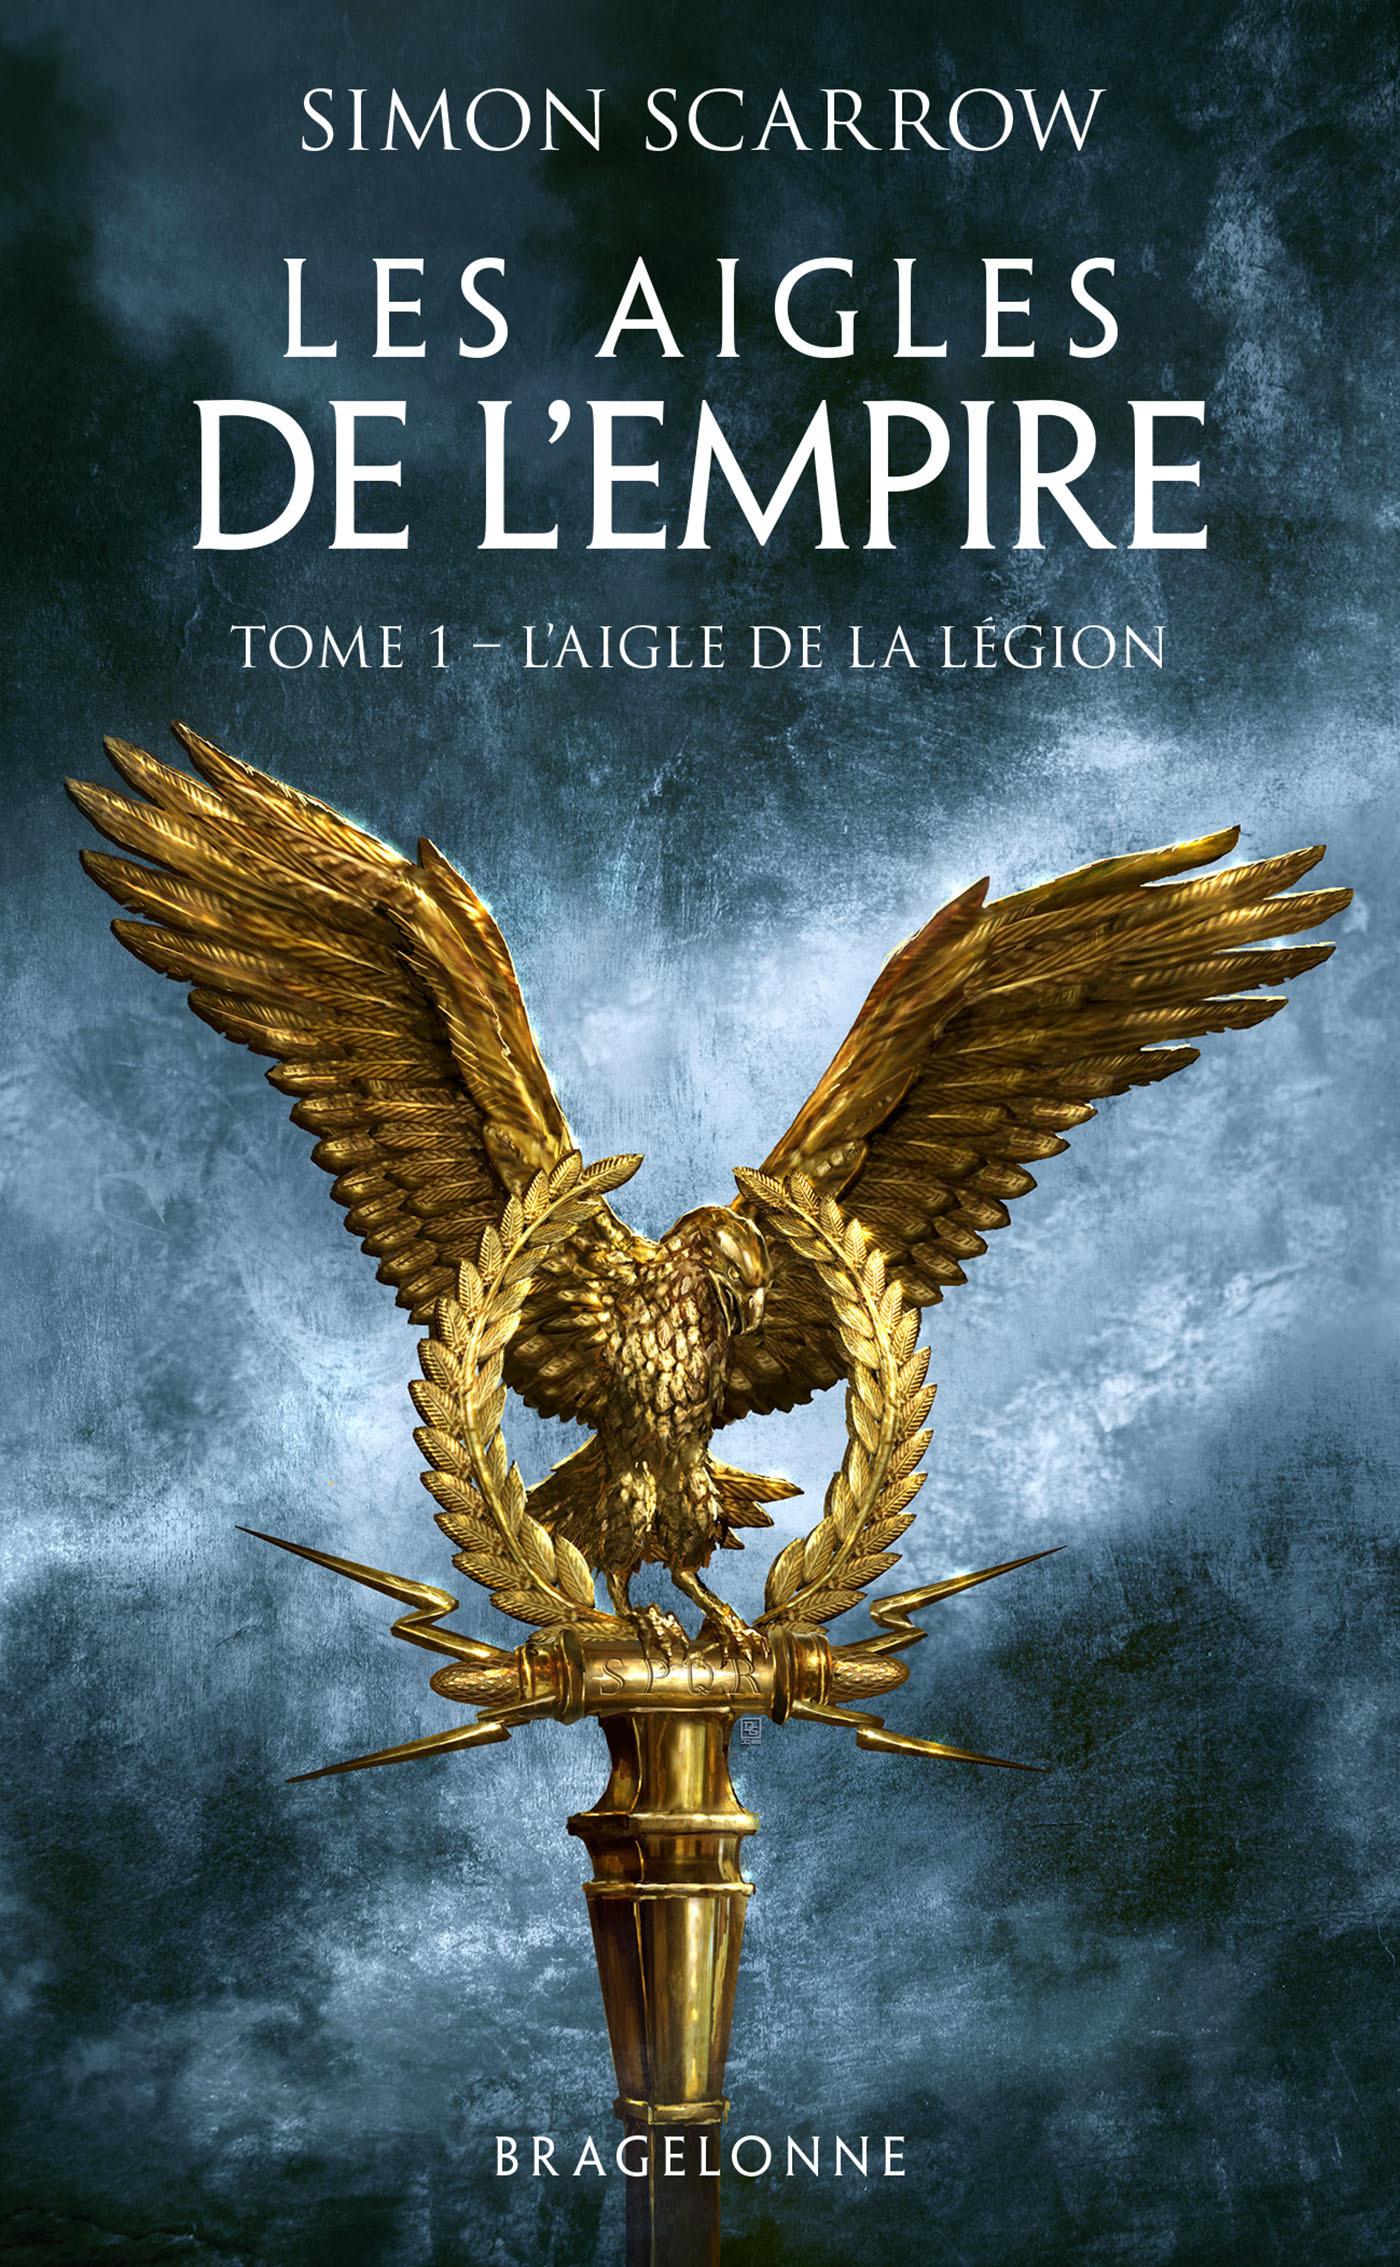 Les aigles de l'empire T.1 ; l'aigle de la légion